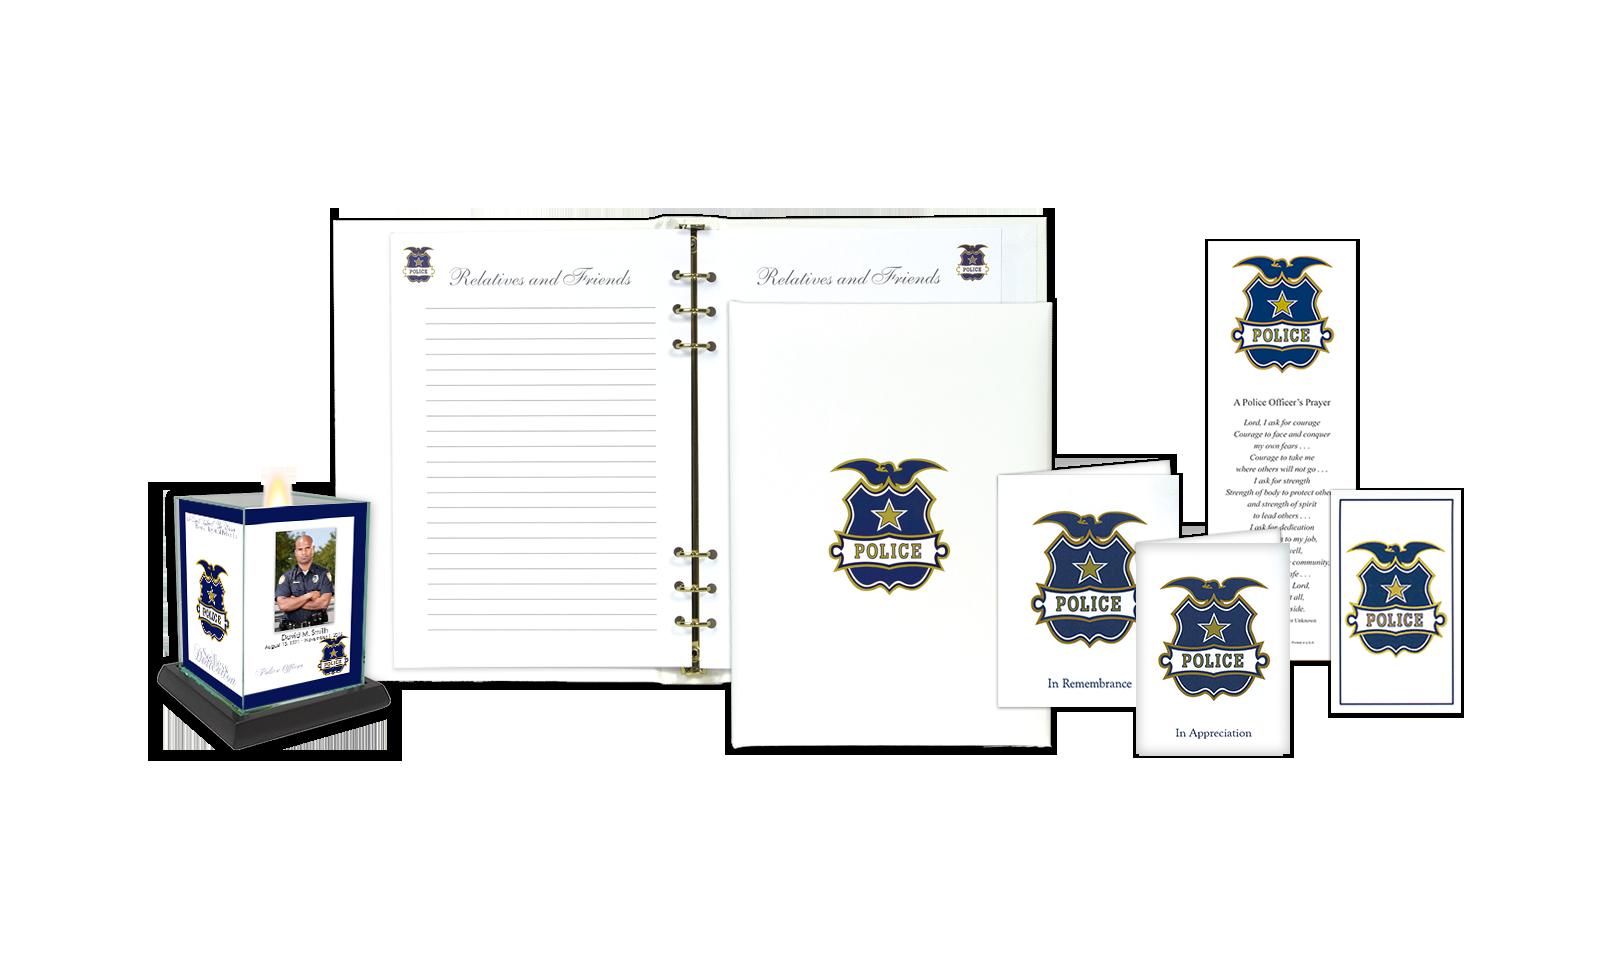 ROL Police Series 262 IC